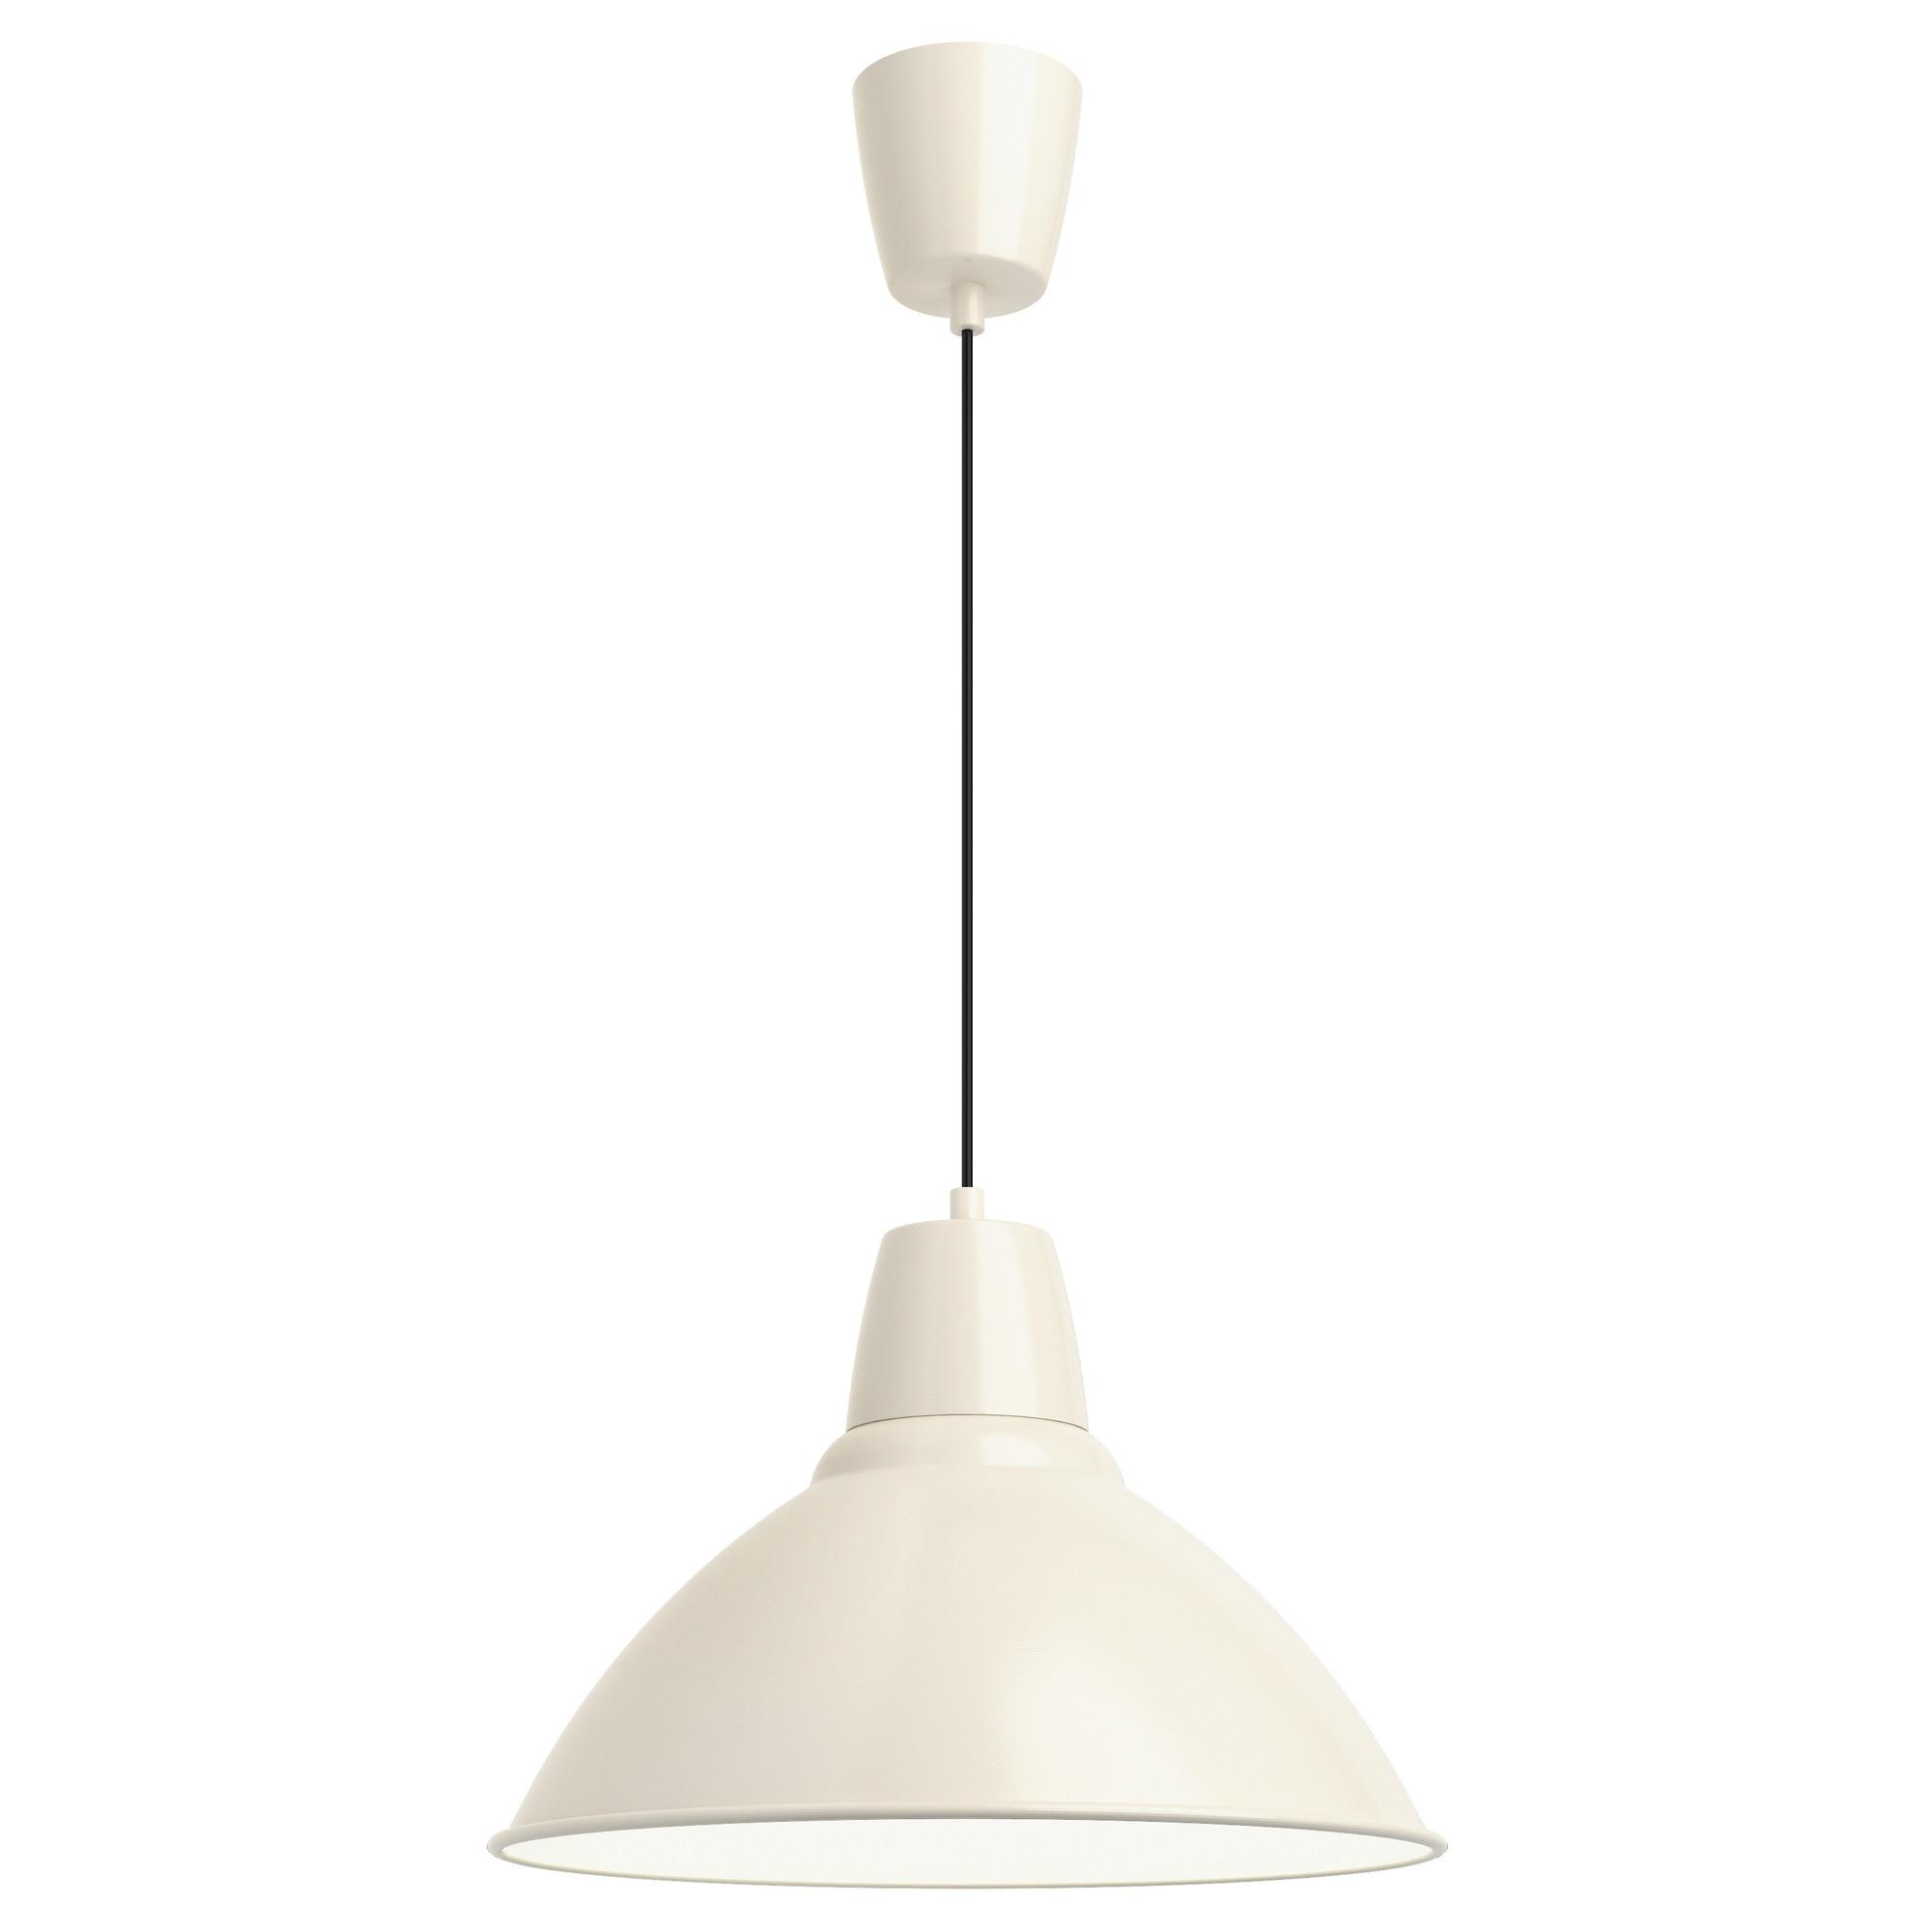 ceiling lamp ikea foto pendant lamp PBRPZAD